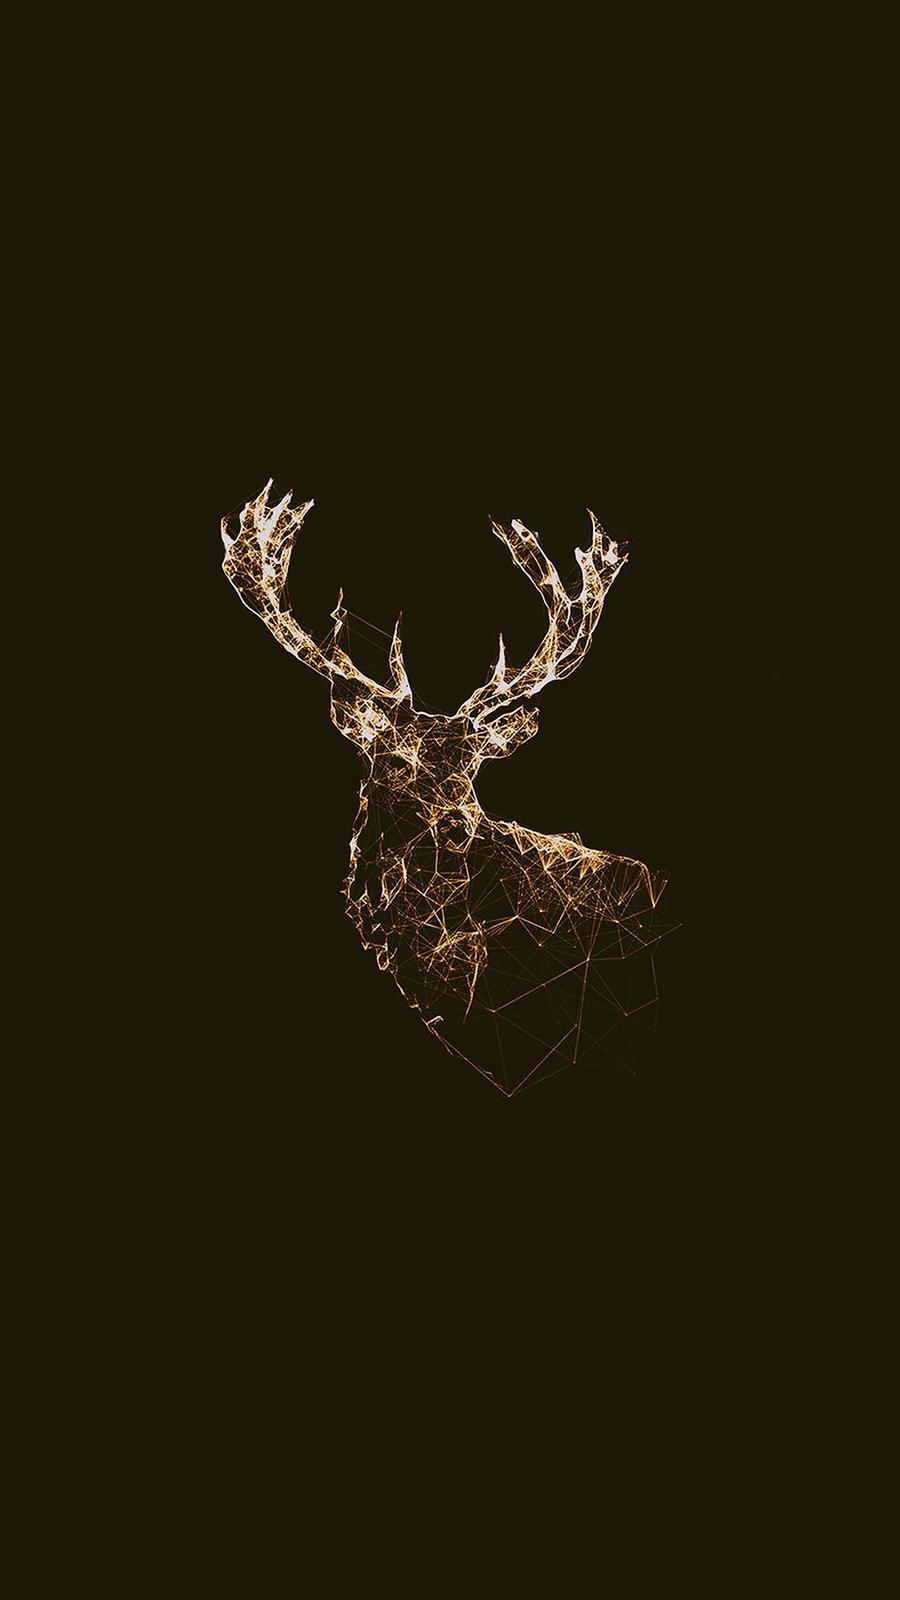 Golden Low Poly Deer Illustration Android Wallpaper